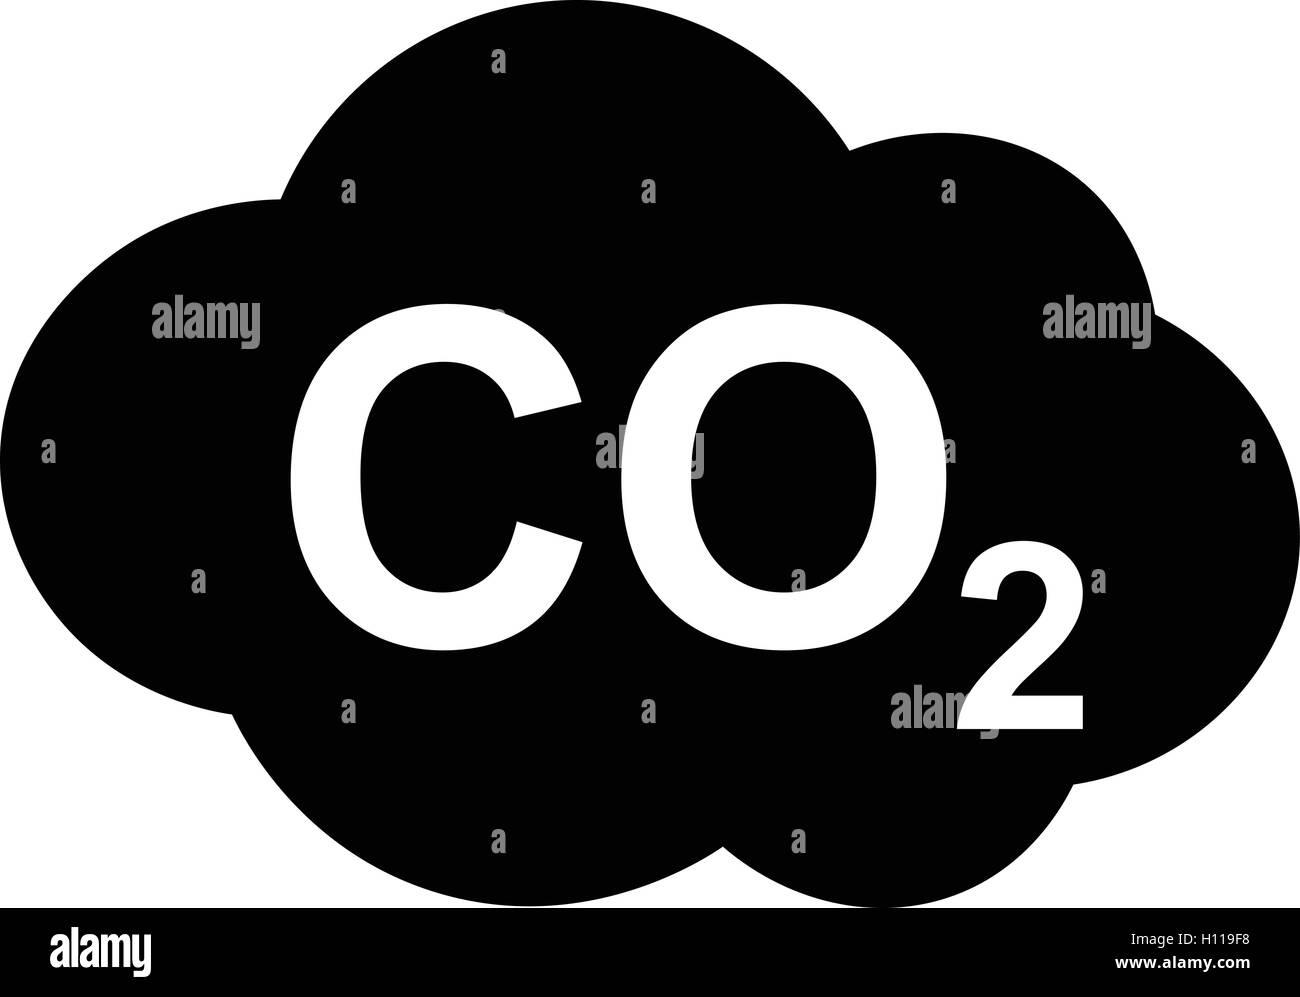 Co2 icon carbon dioxide formula symbol vector illustration co2 co2 icon carbon dioxide formula symbol vector illustration co2 sign buycottarizona Images